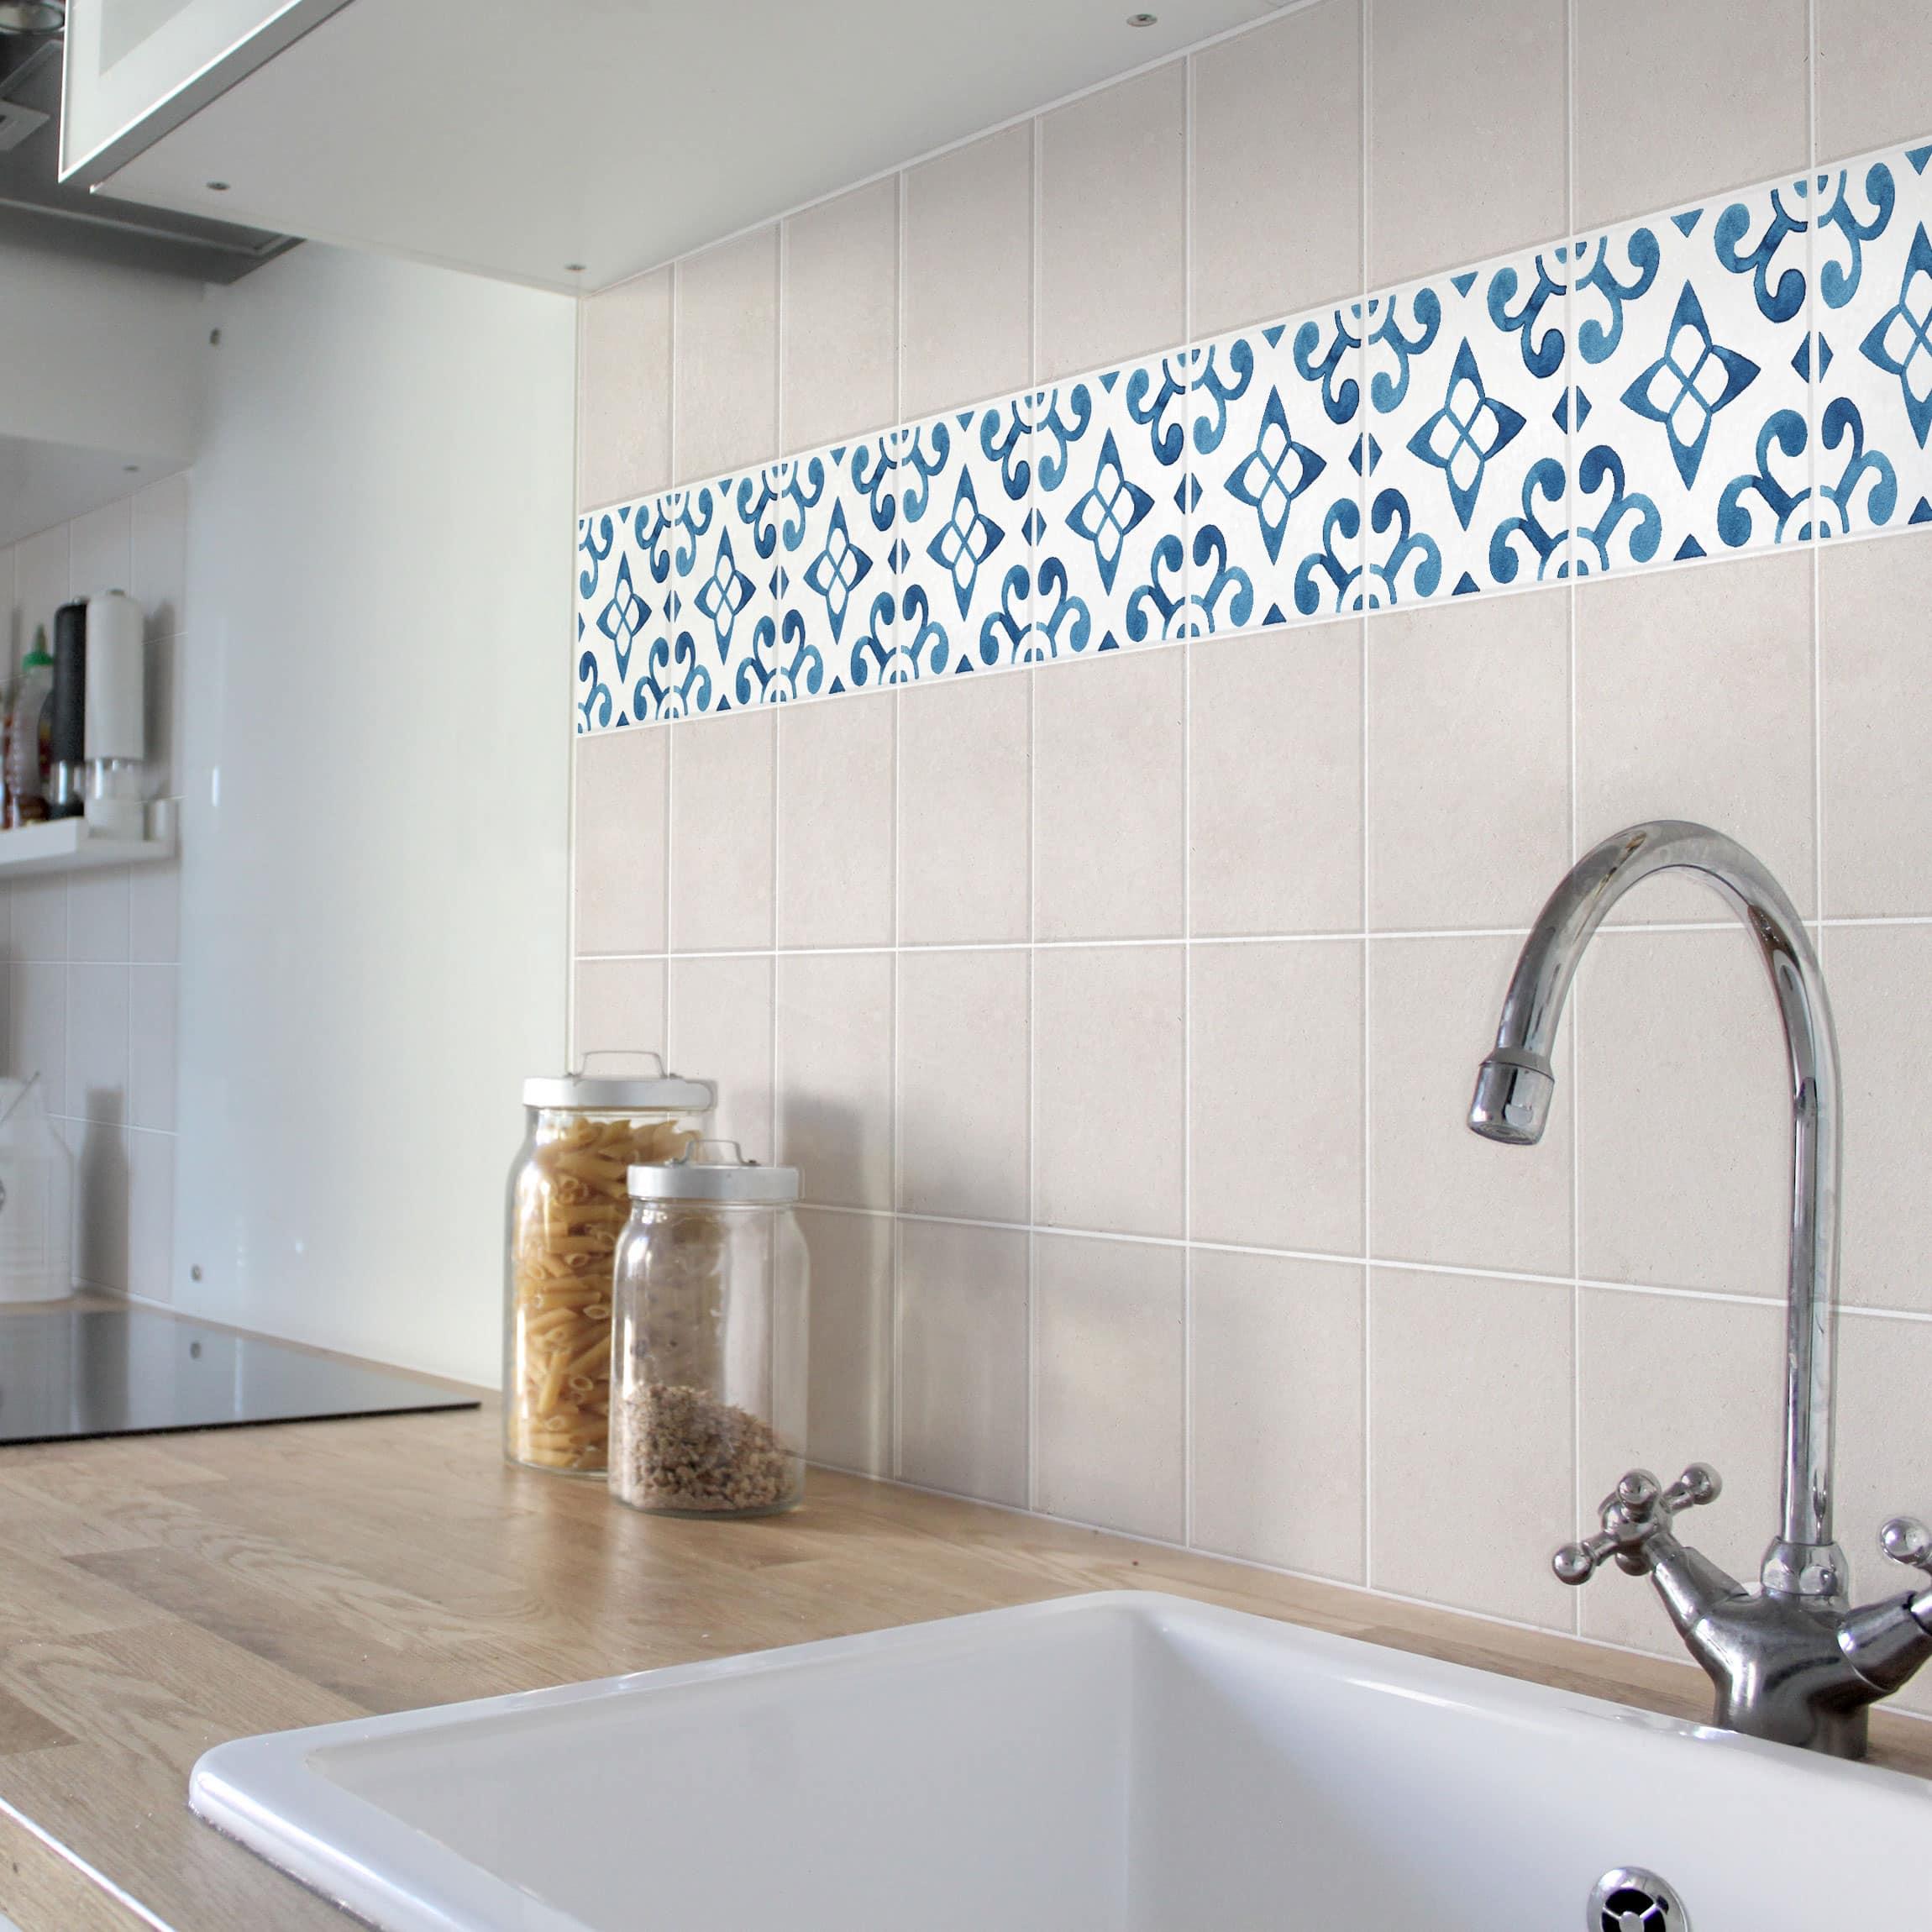 fliesen bord re muster blau wei serie no 5 1 1 quadrat 15cm x 15cm fliesenaufkleber. Black Bedroom Furniture Sets. Home Design Ideas